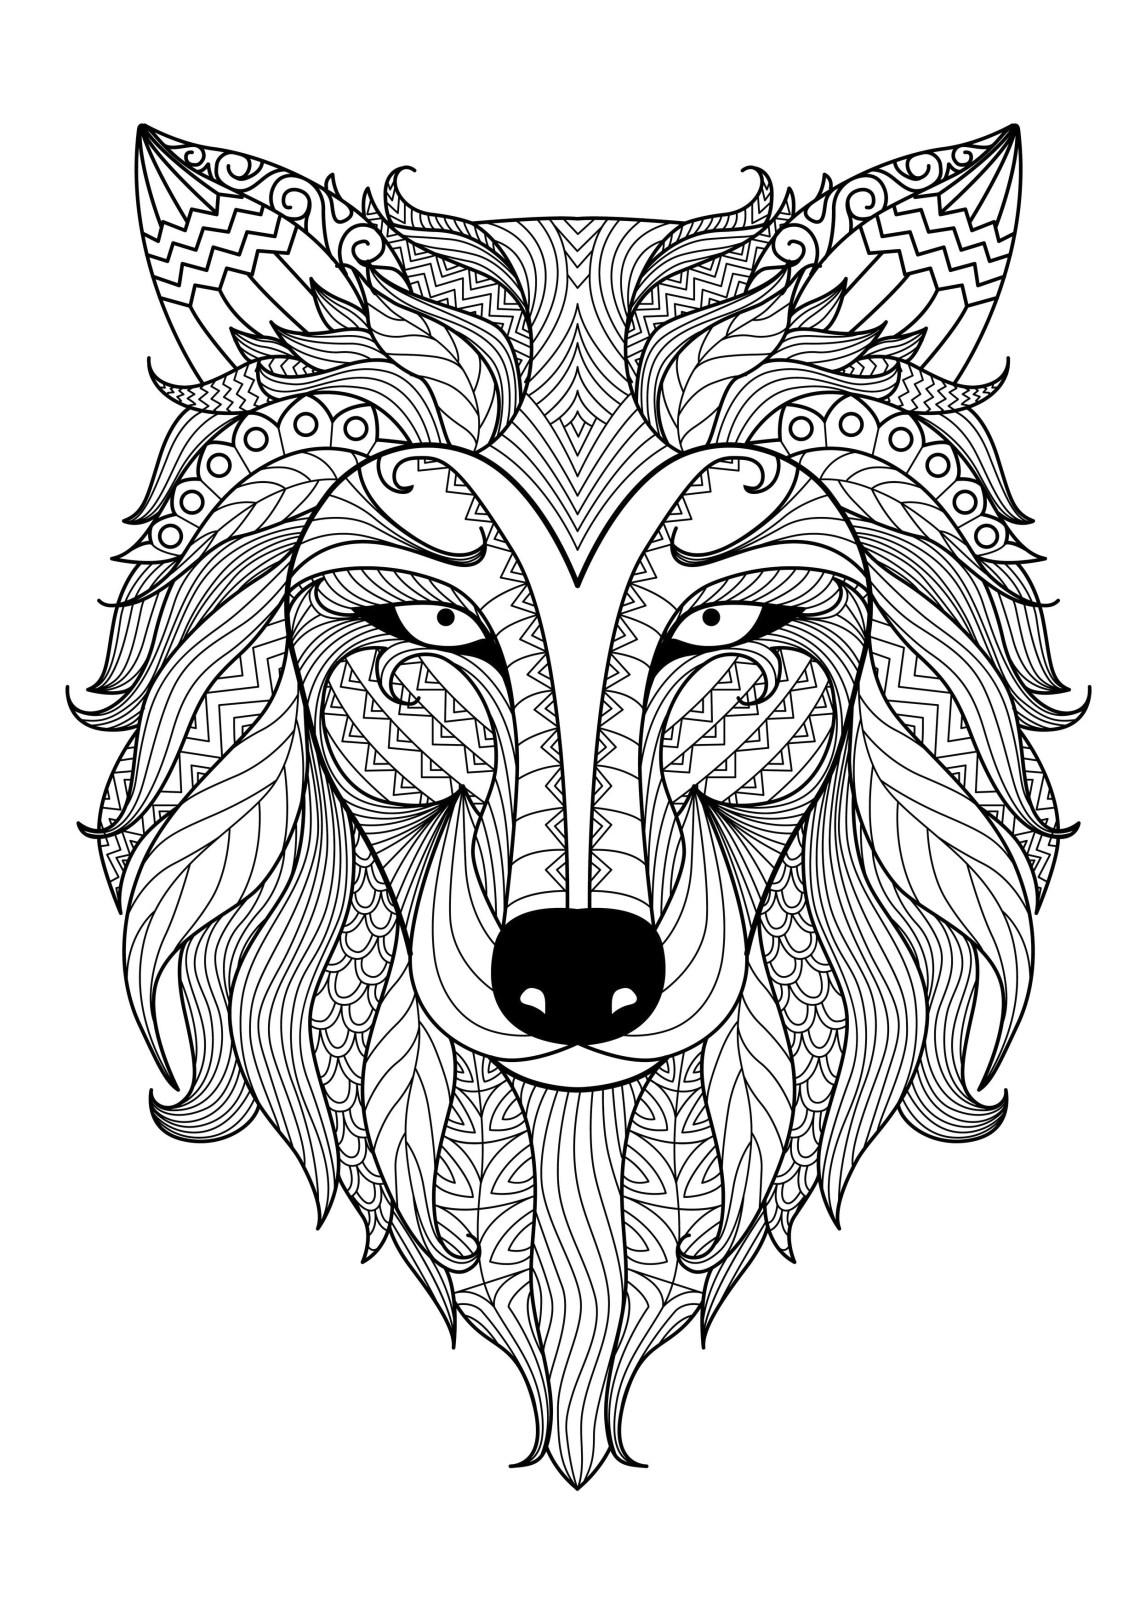 Incredible wolf by bimdeedee   Animals - Coloring pages ...   coloring pages for adults animals